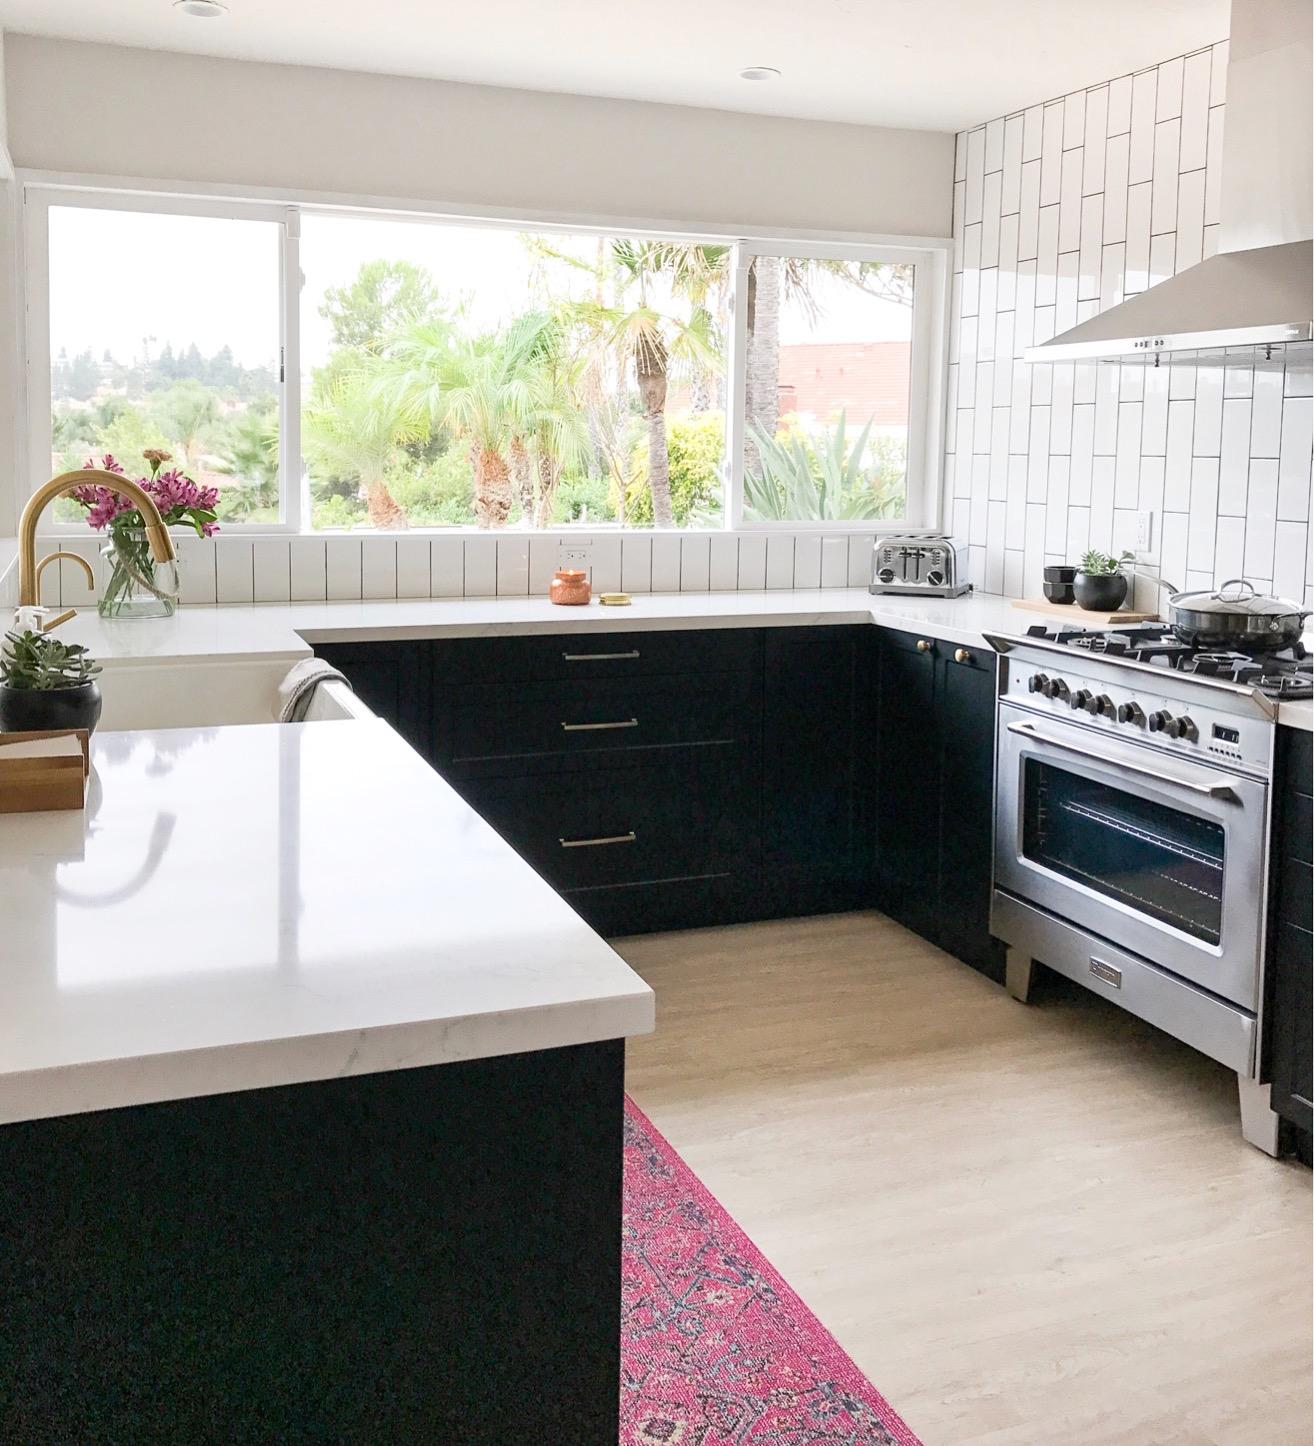 California Kitchen Cabinets: Modern Cozy California Ranch: Renovation Progress